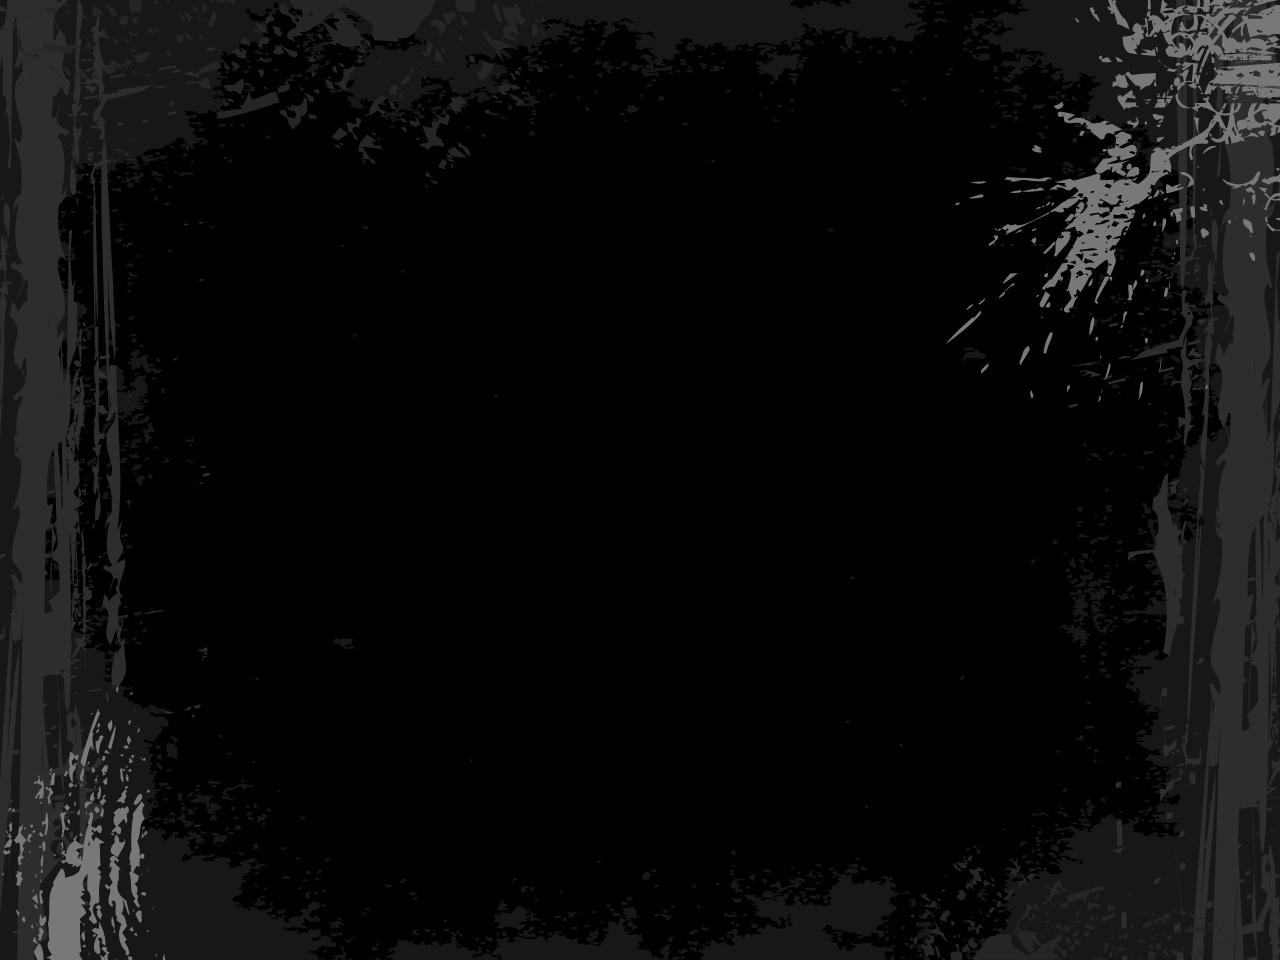 Background image music - Suspense Background Music Free Download Itself Information